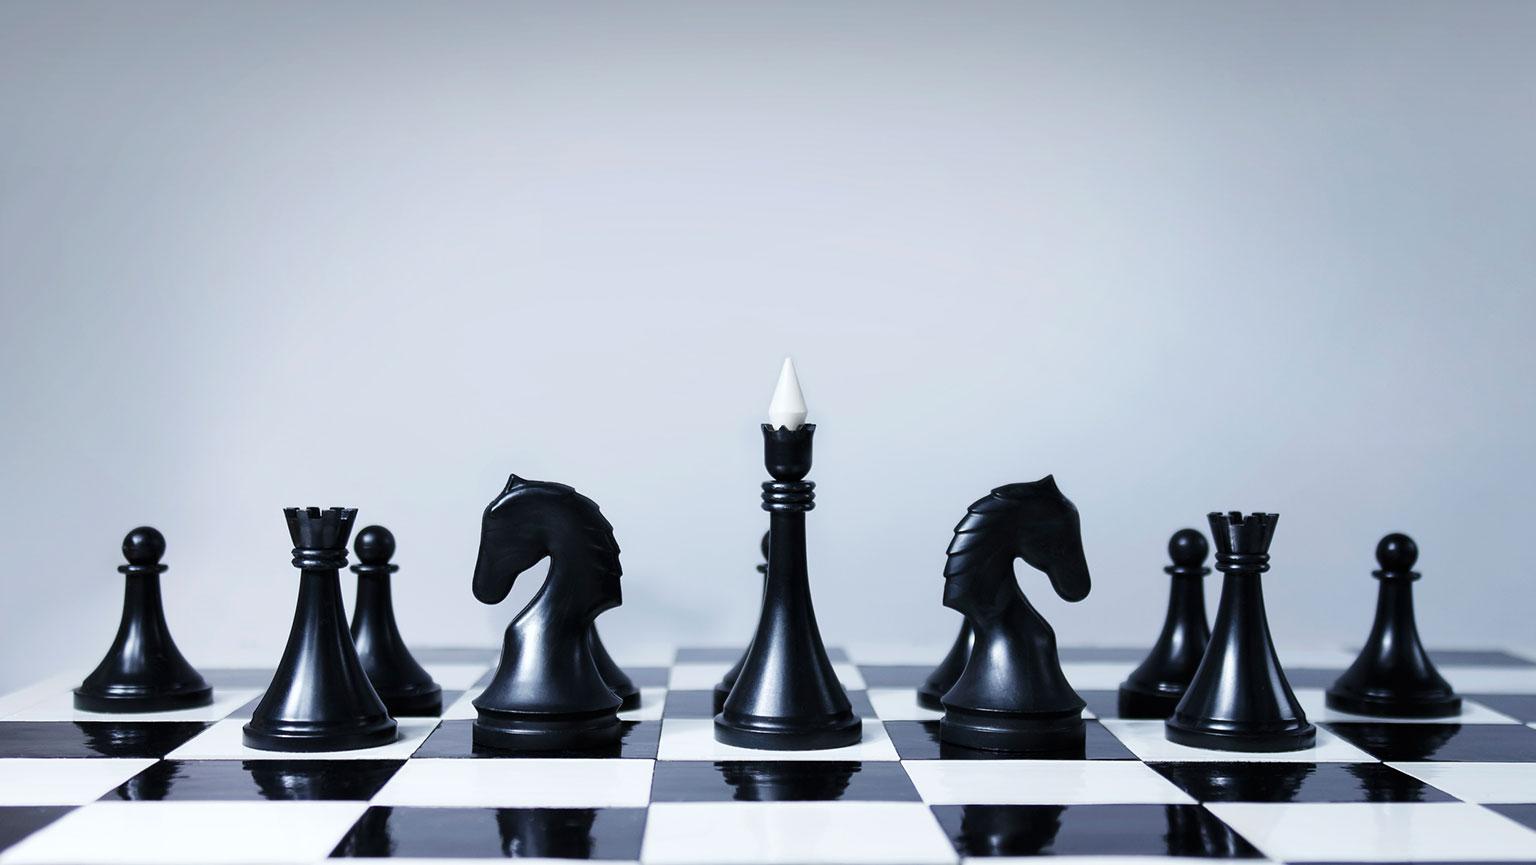 Organizational Behavior: Winning with Teamwork